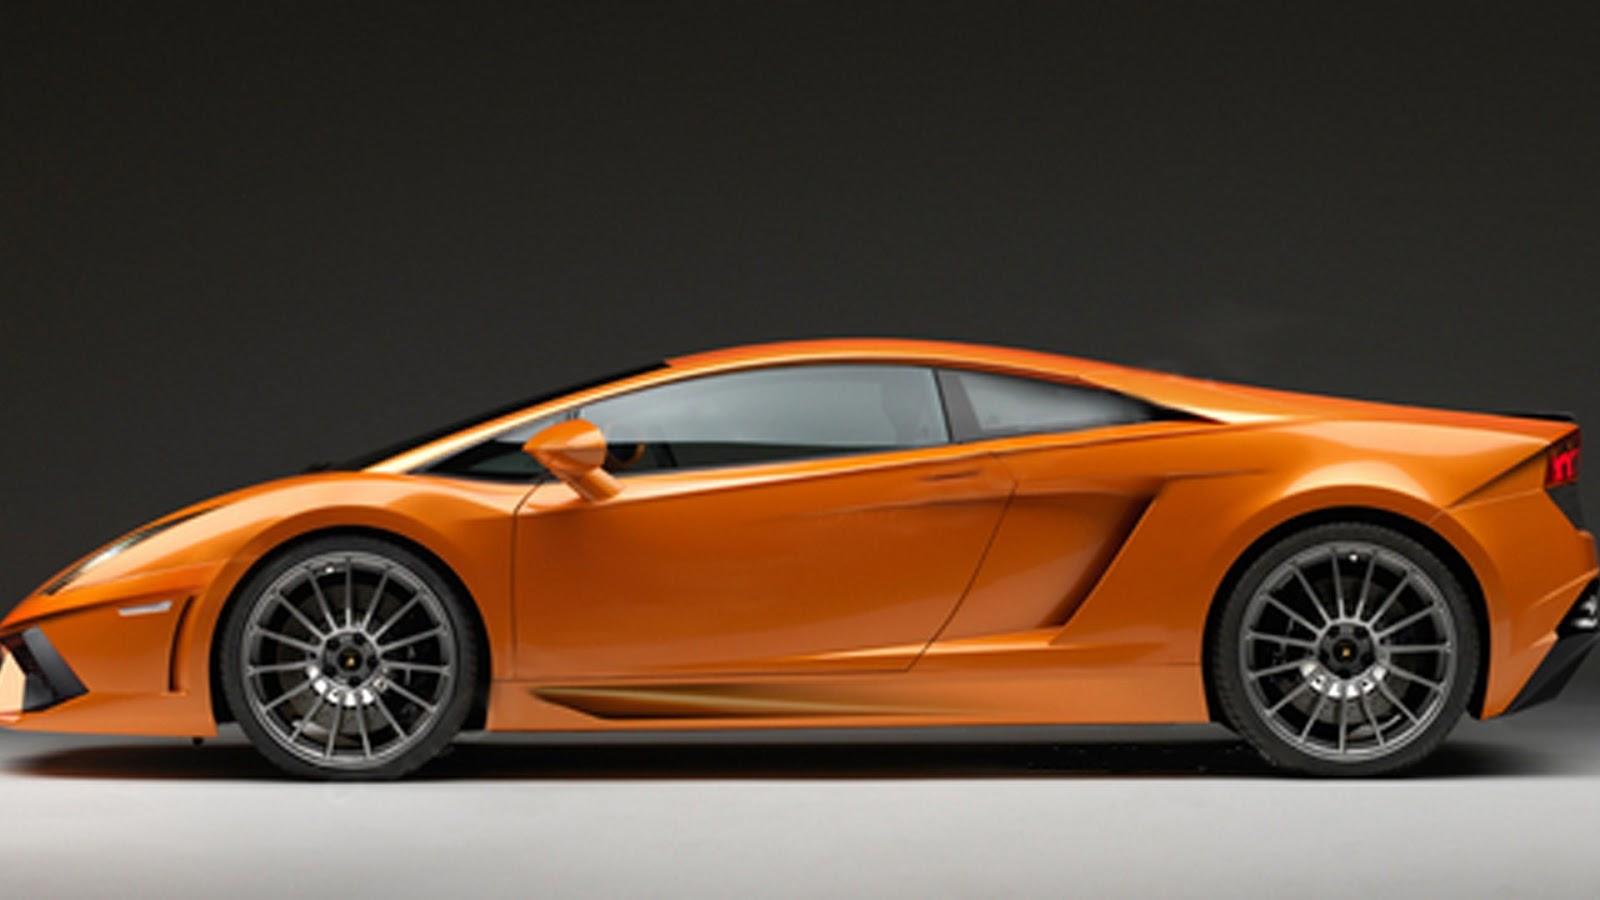 2014 Lamborghini Cabrera Car Review Car Wallpaper